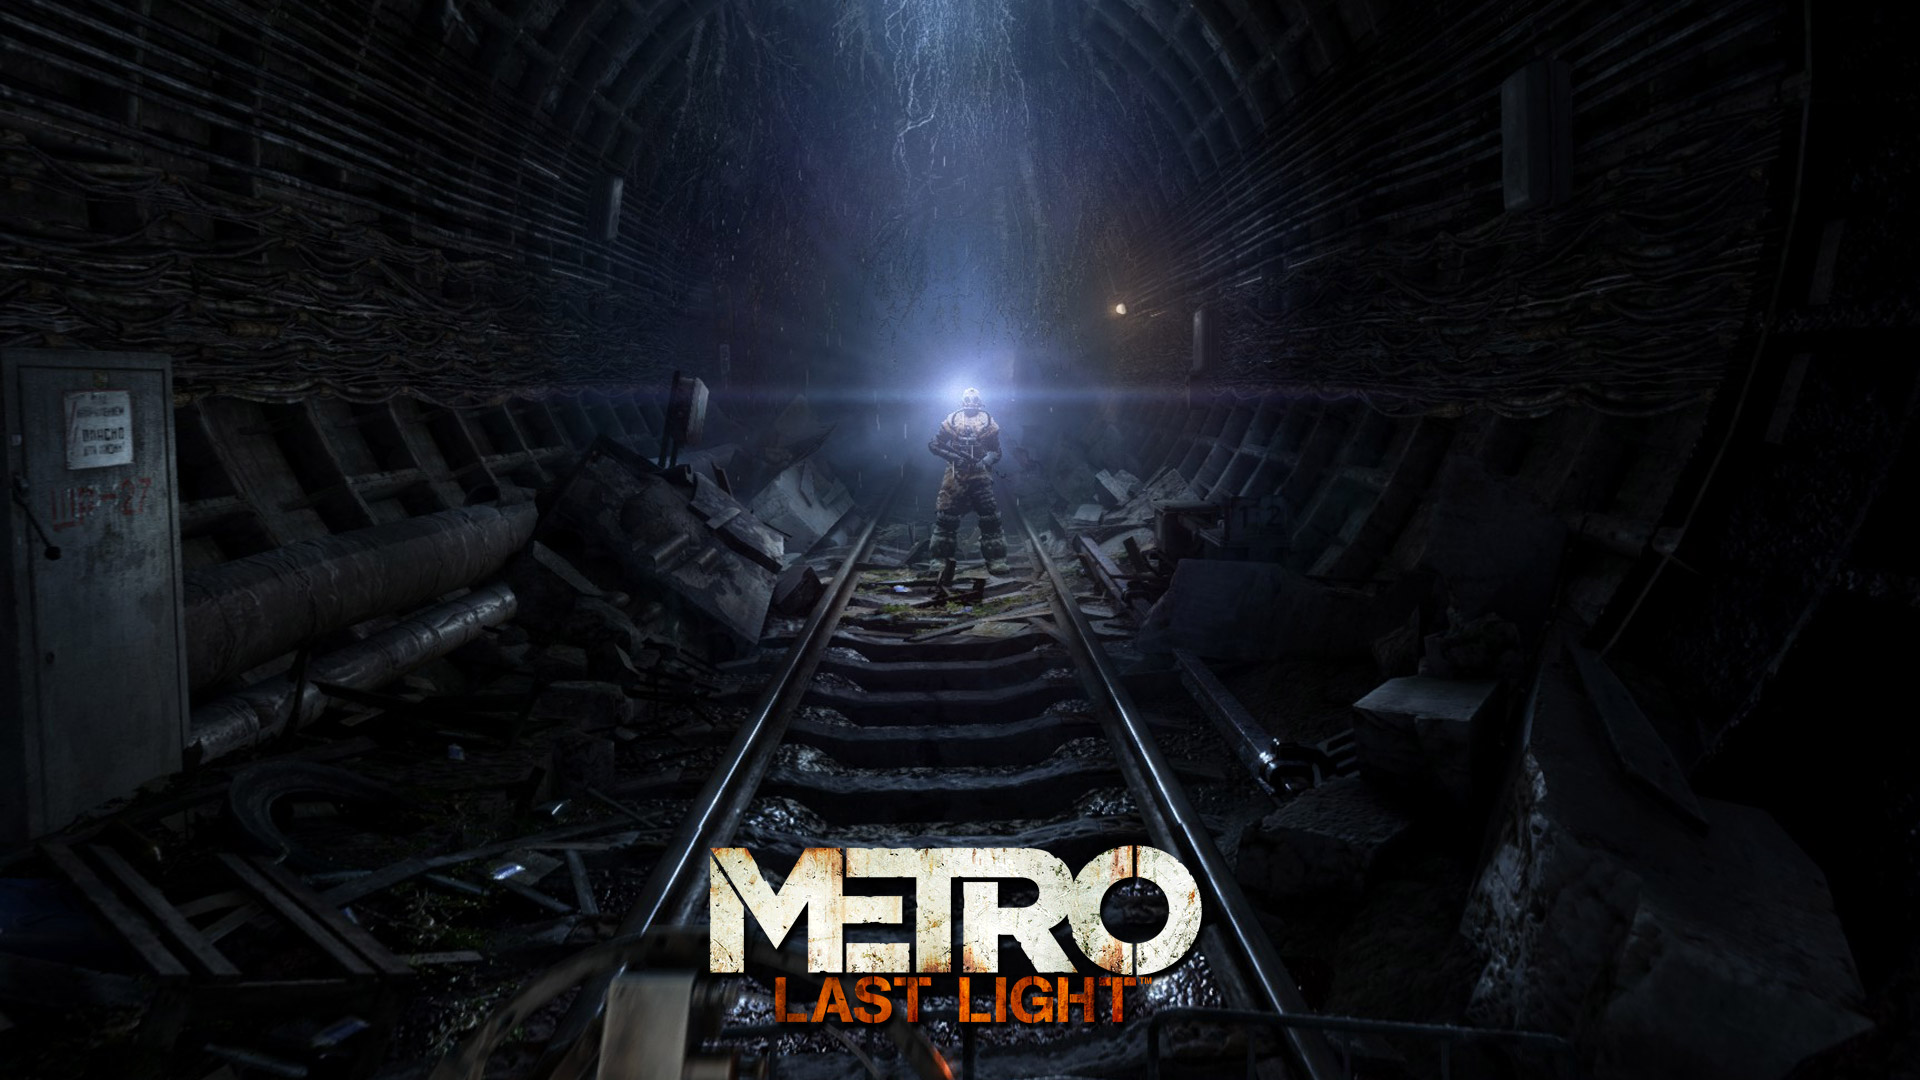 Free Metro: Last Light Wallpaper in 1920x1080